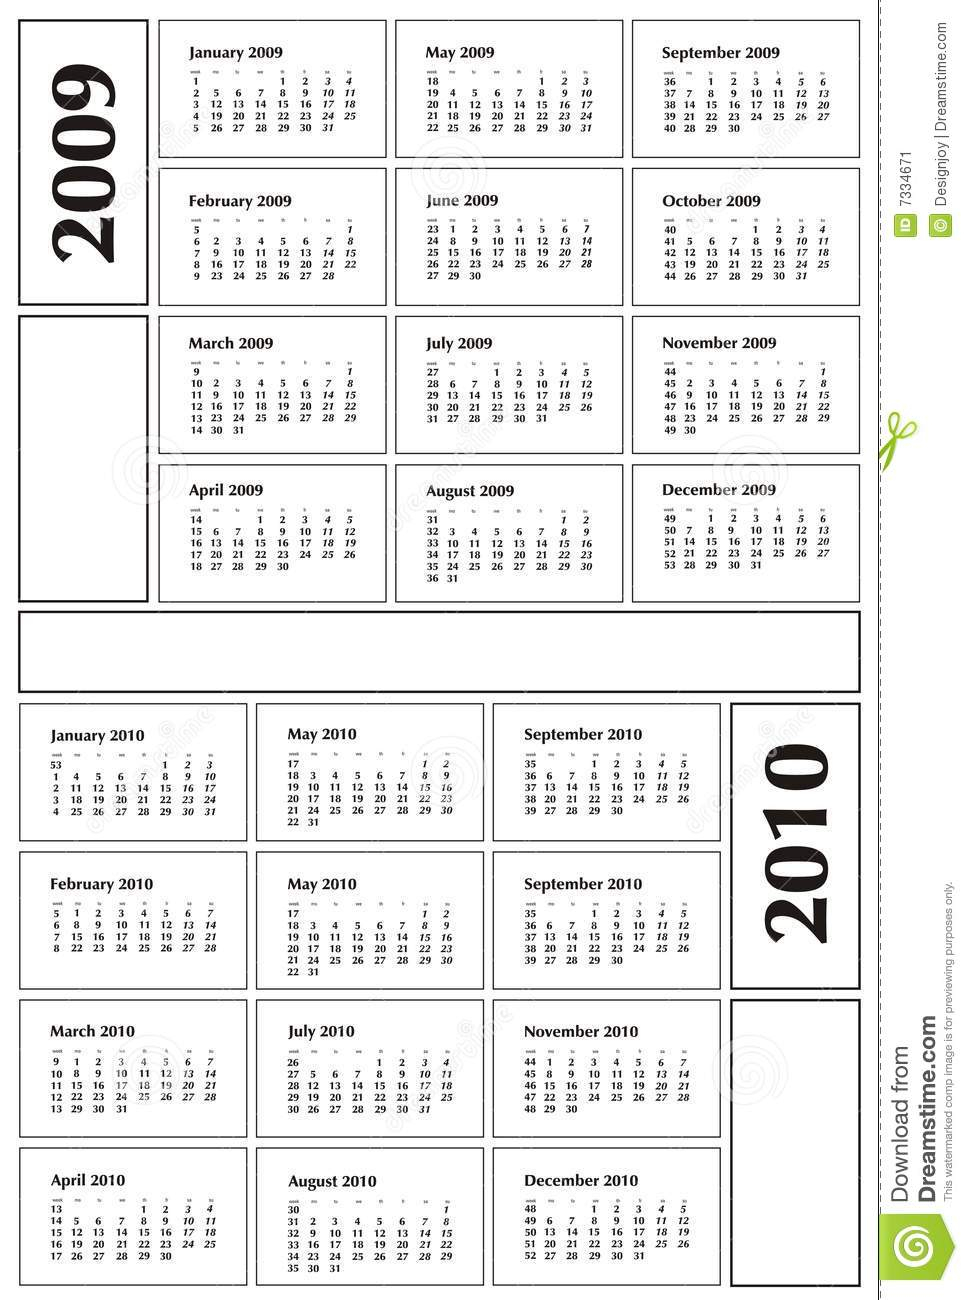 Calendar 2009 And 2010 Stock Image - Image: 7334671